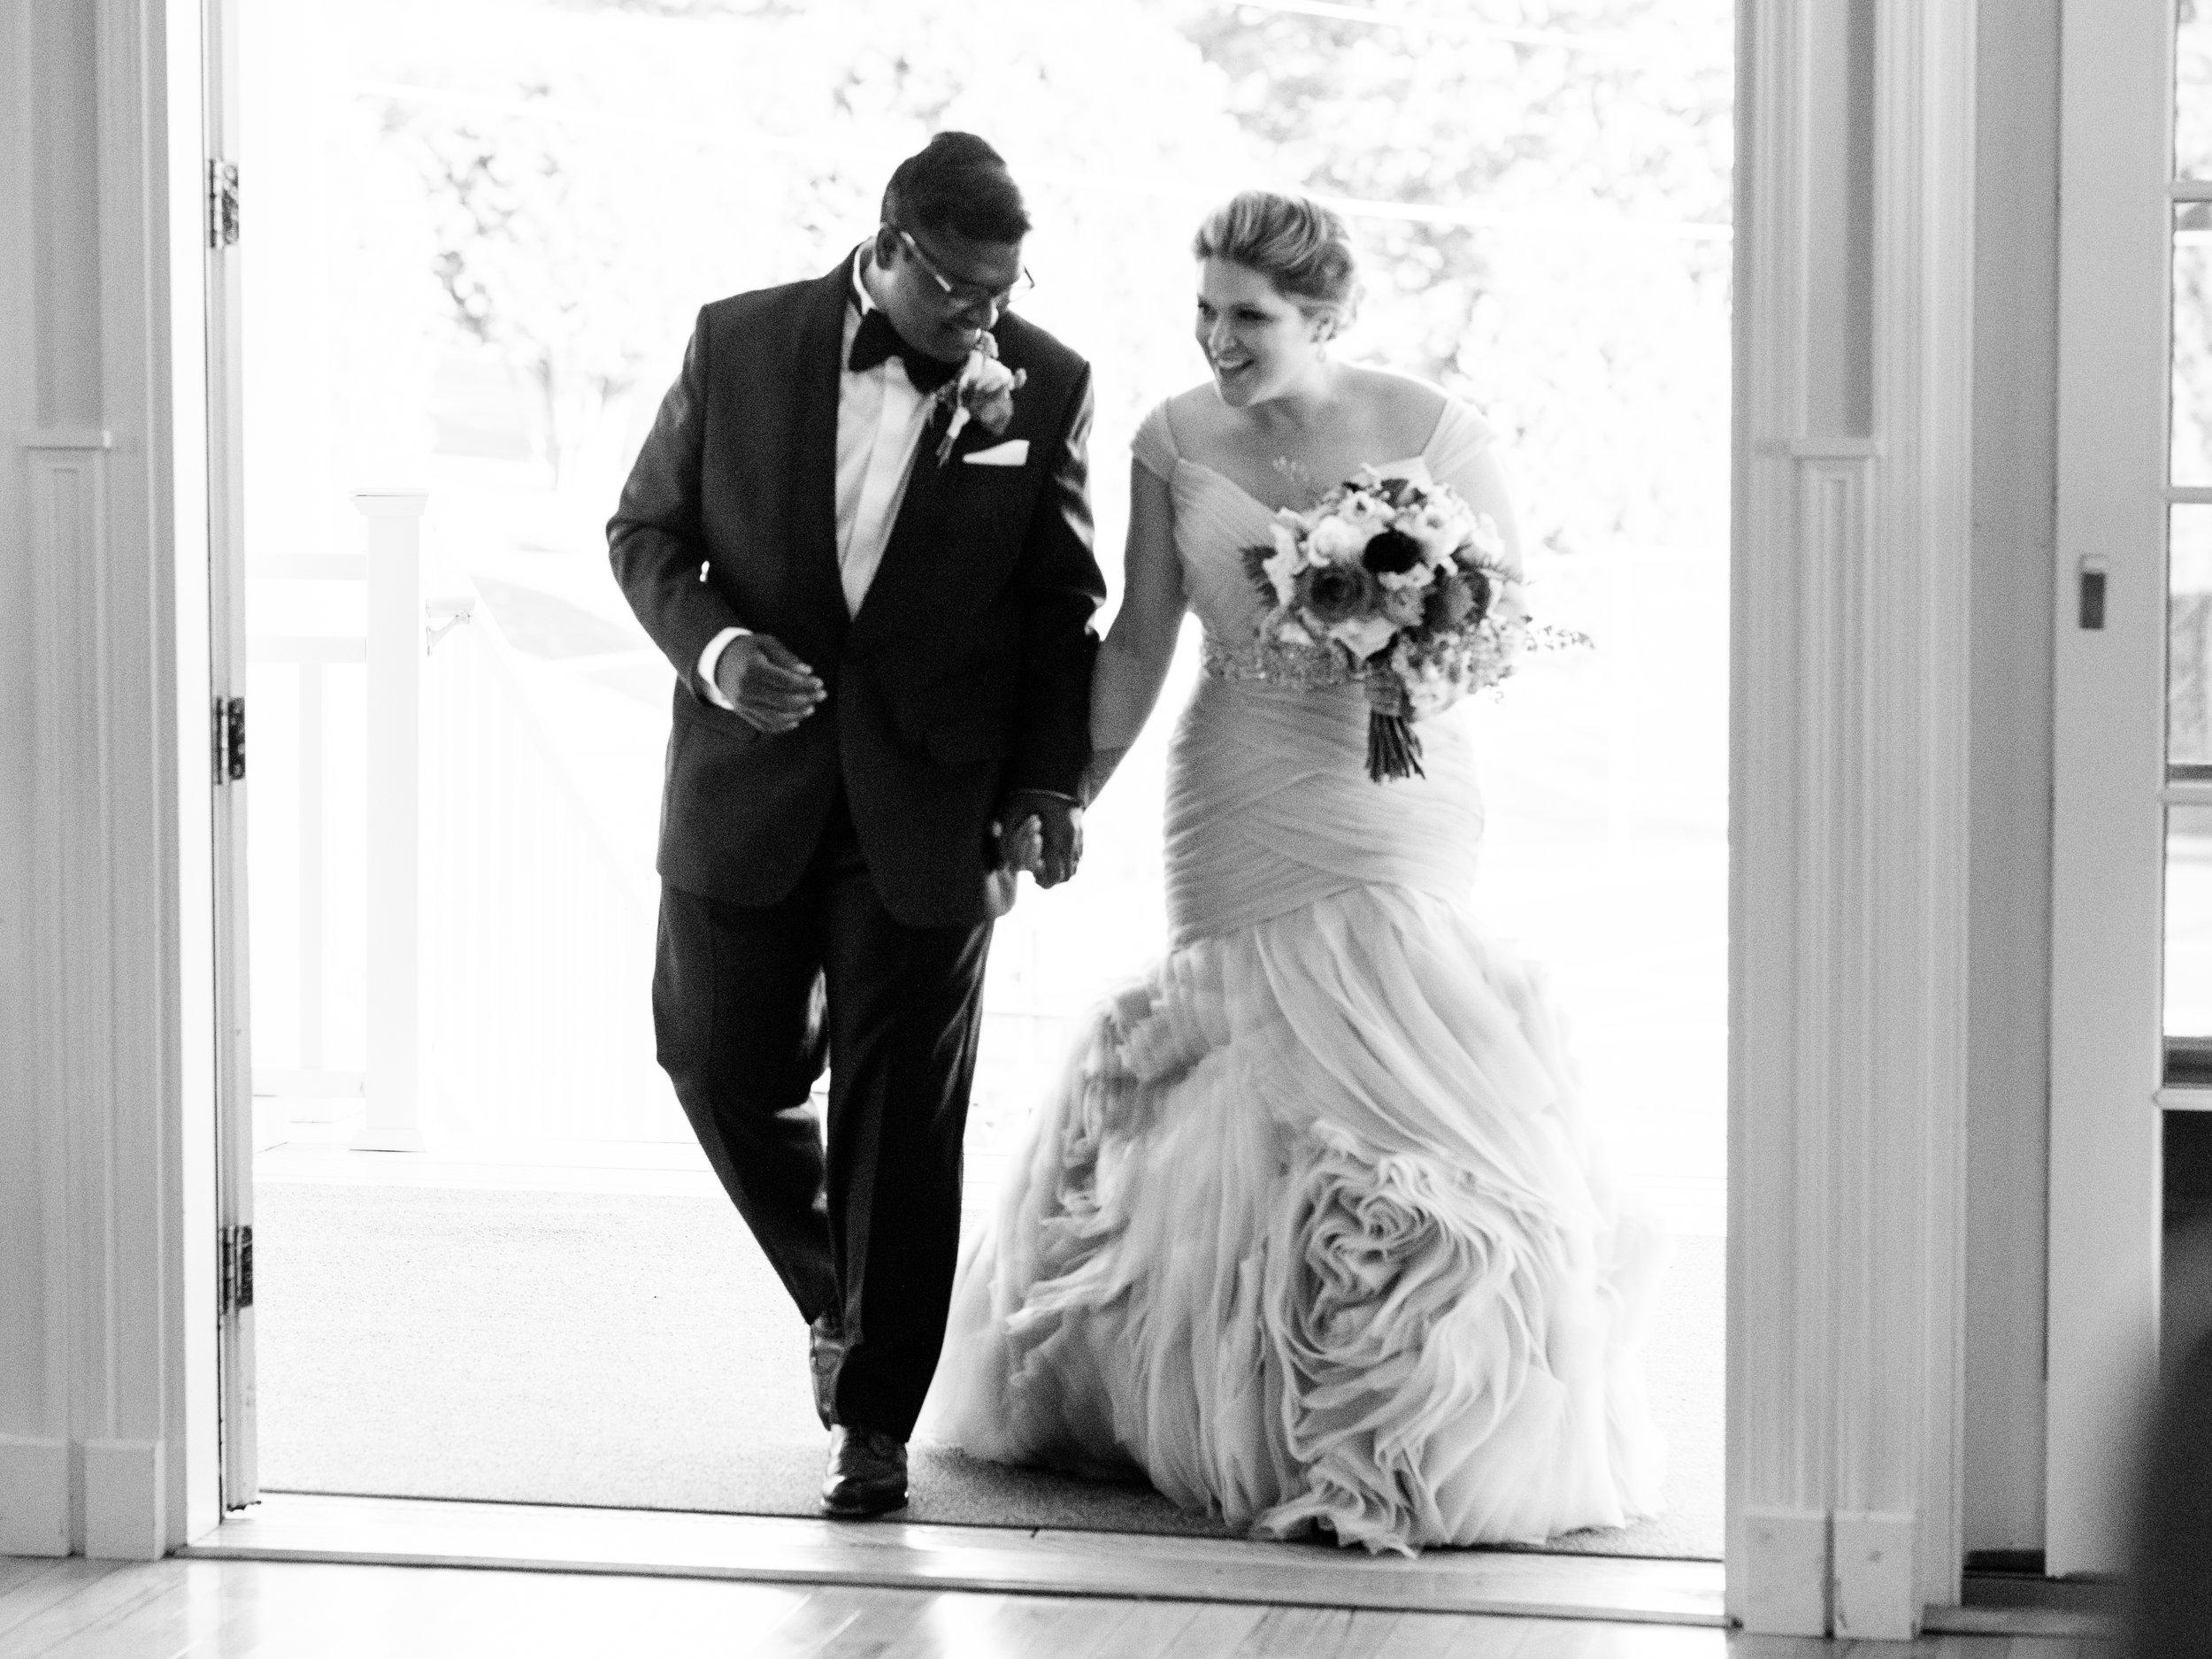 Govathoti+Wedding+Reception+A-62.jpg